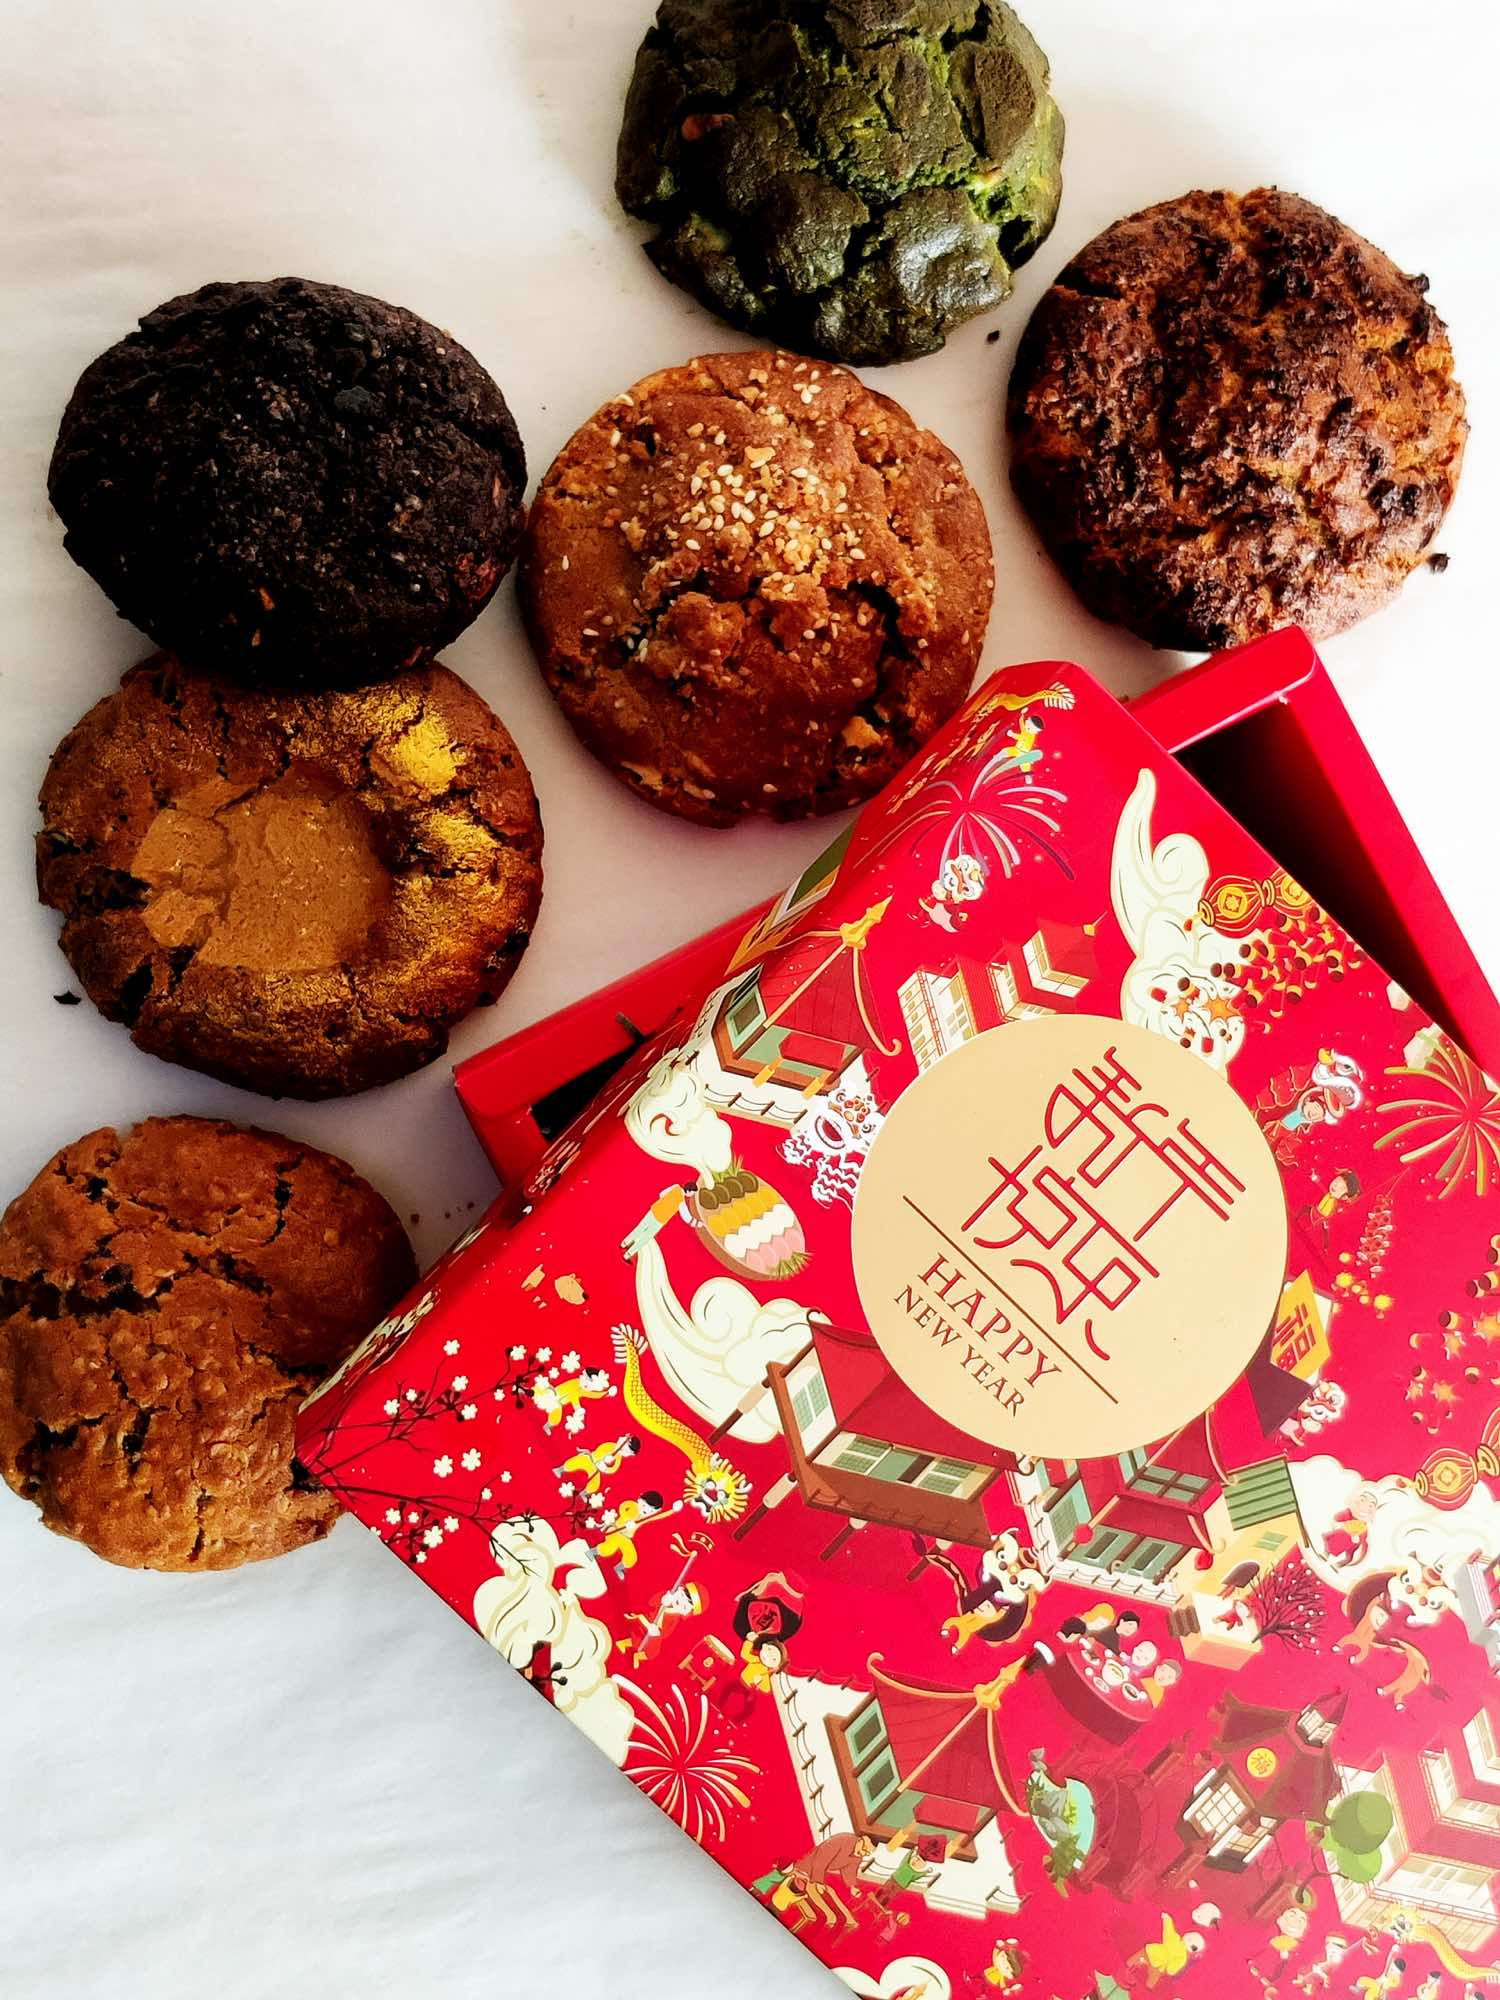 Cookie Vission  喜迎犇騰新歲 推出新春期間限定曲奇及賀年禮盒